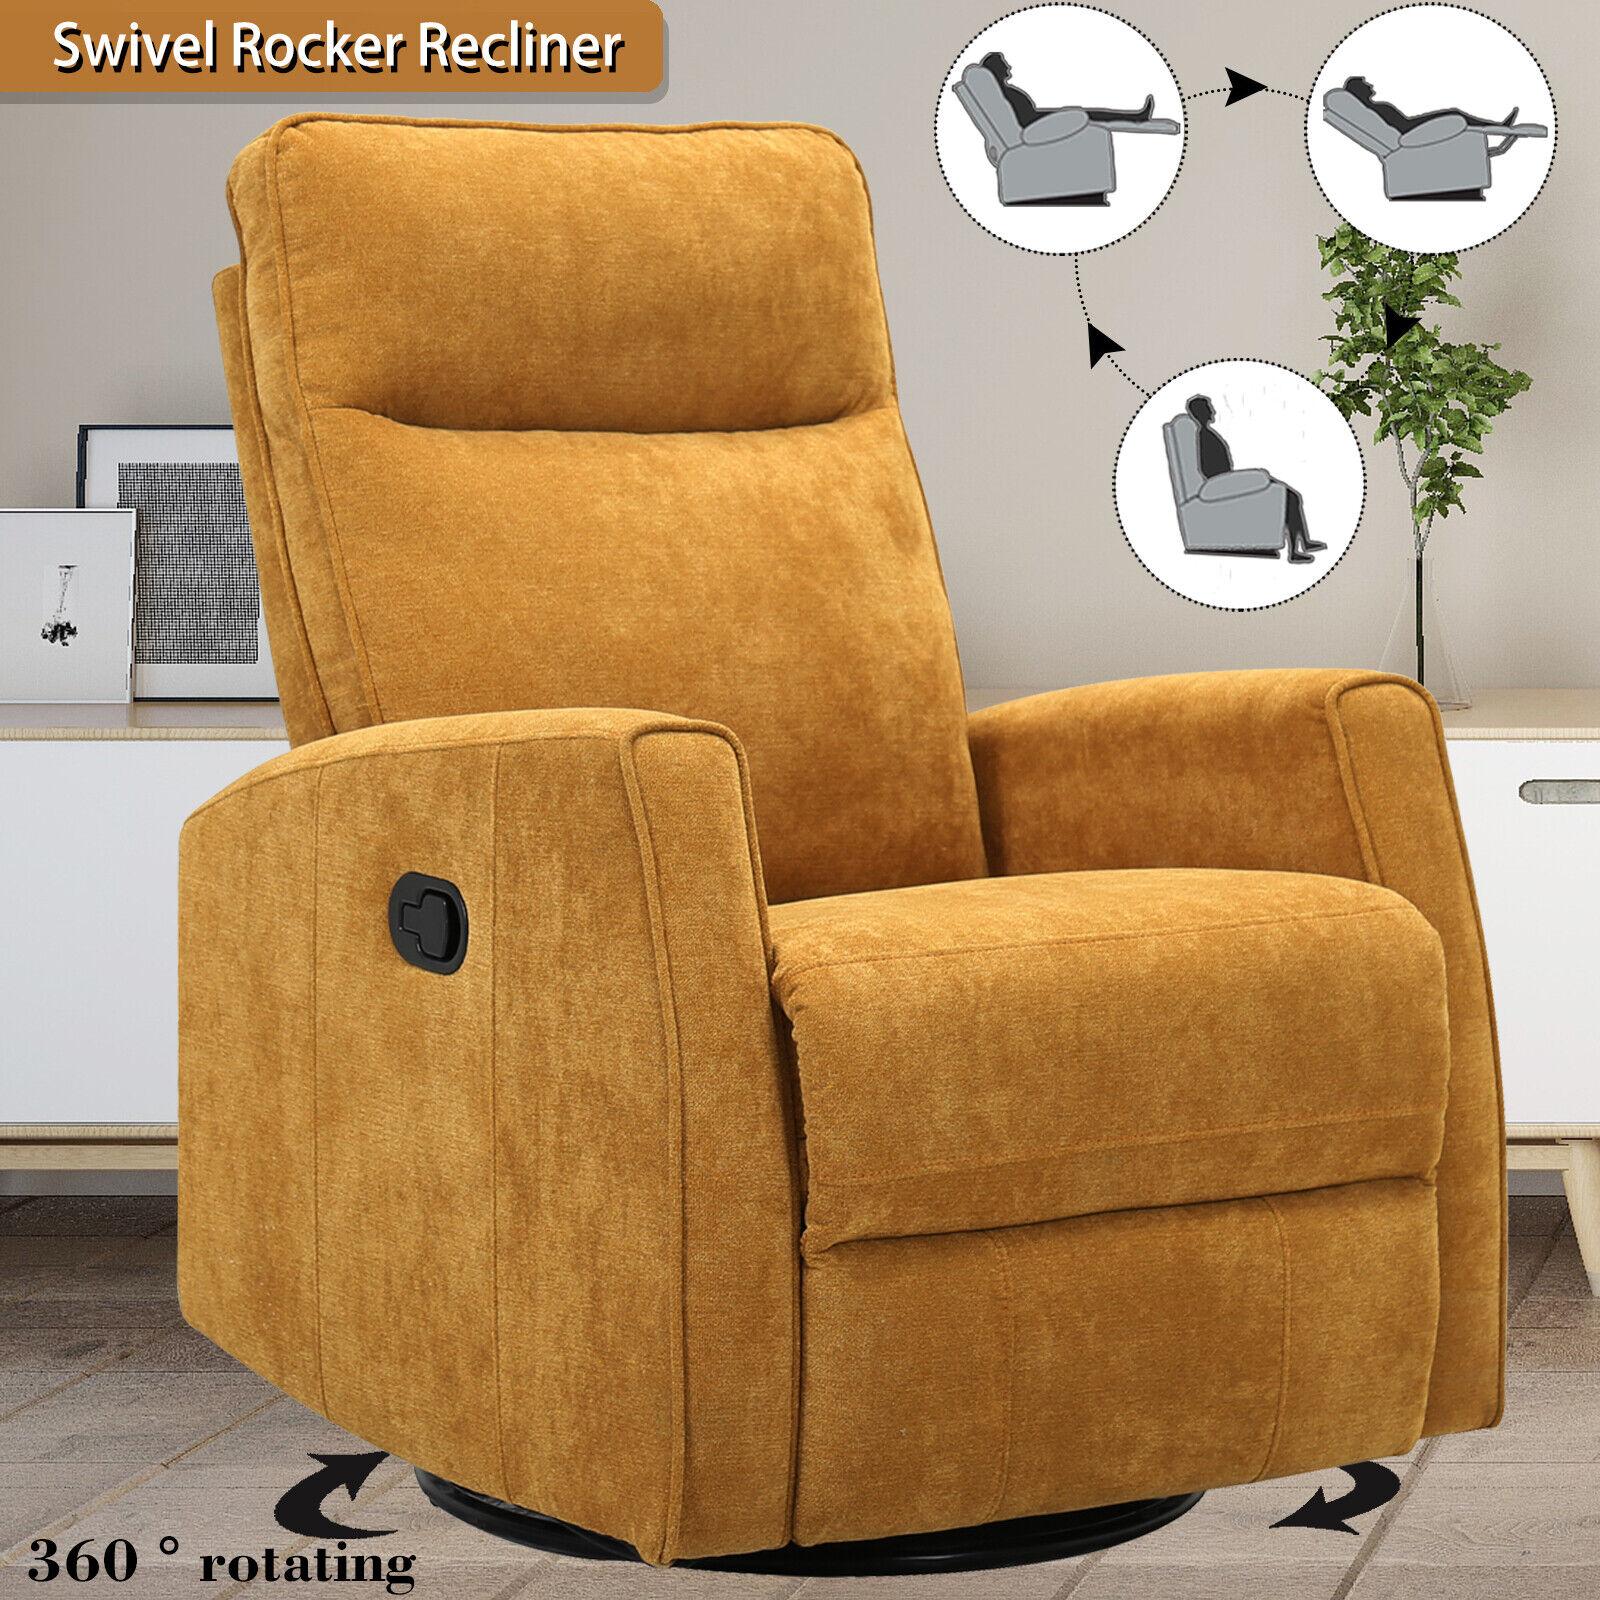 Swivel Rocker Recliner Chair Baby Nursery Rocking Chair Sofa